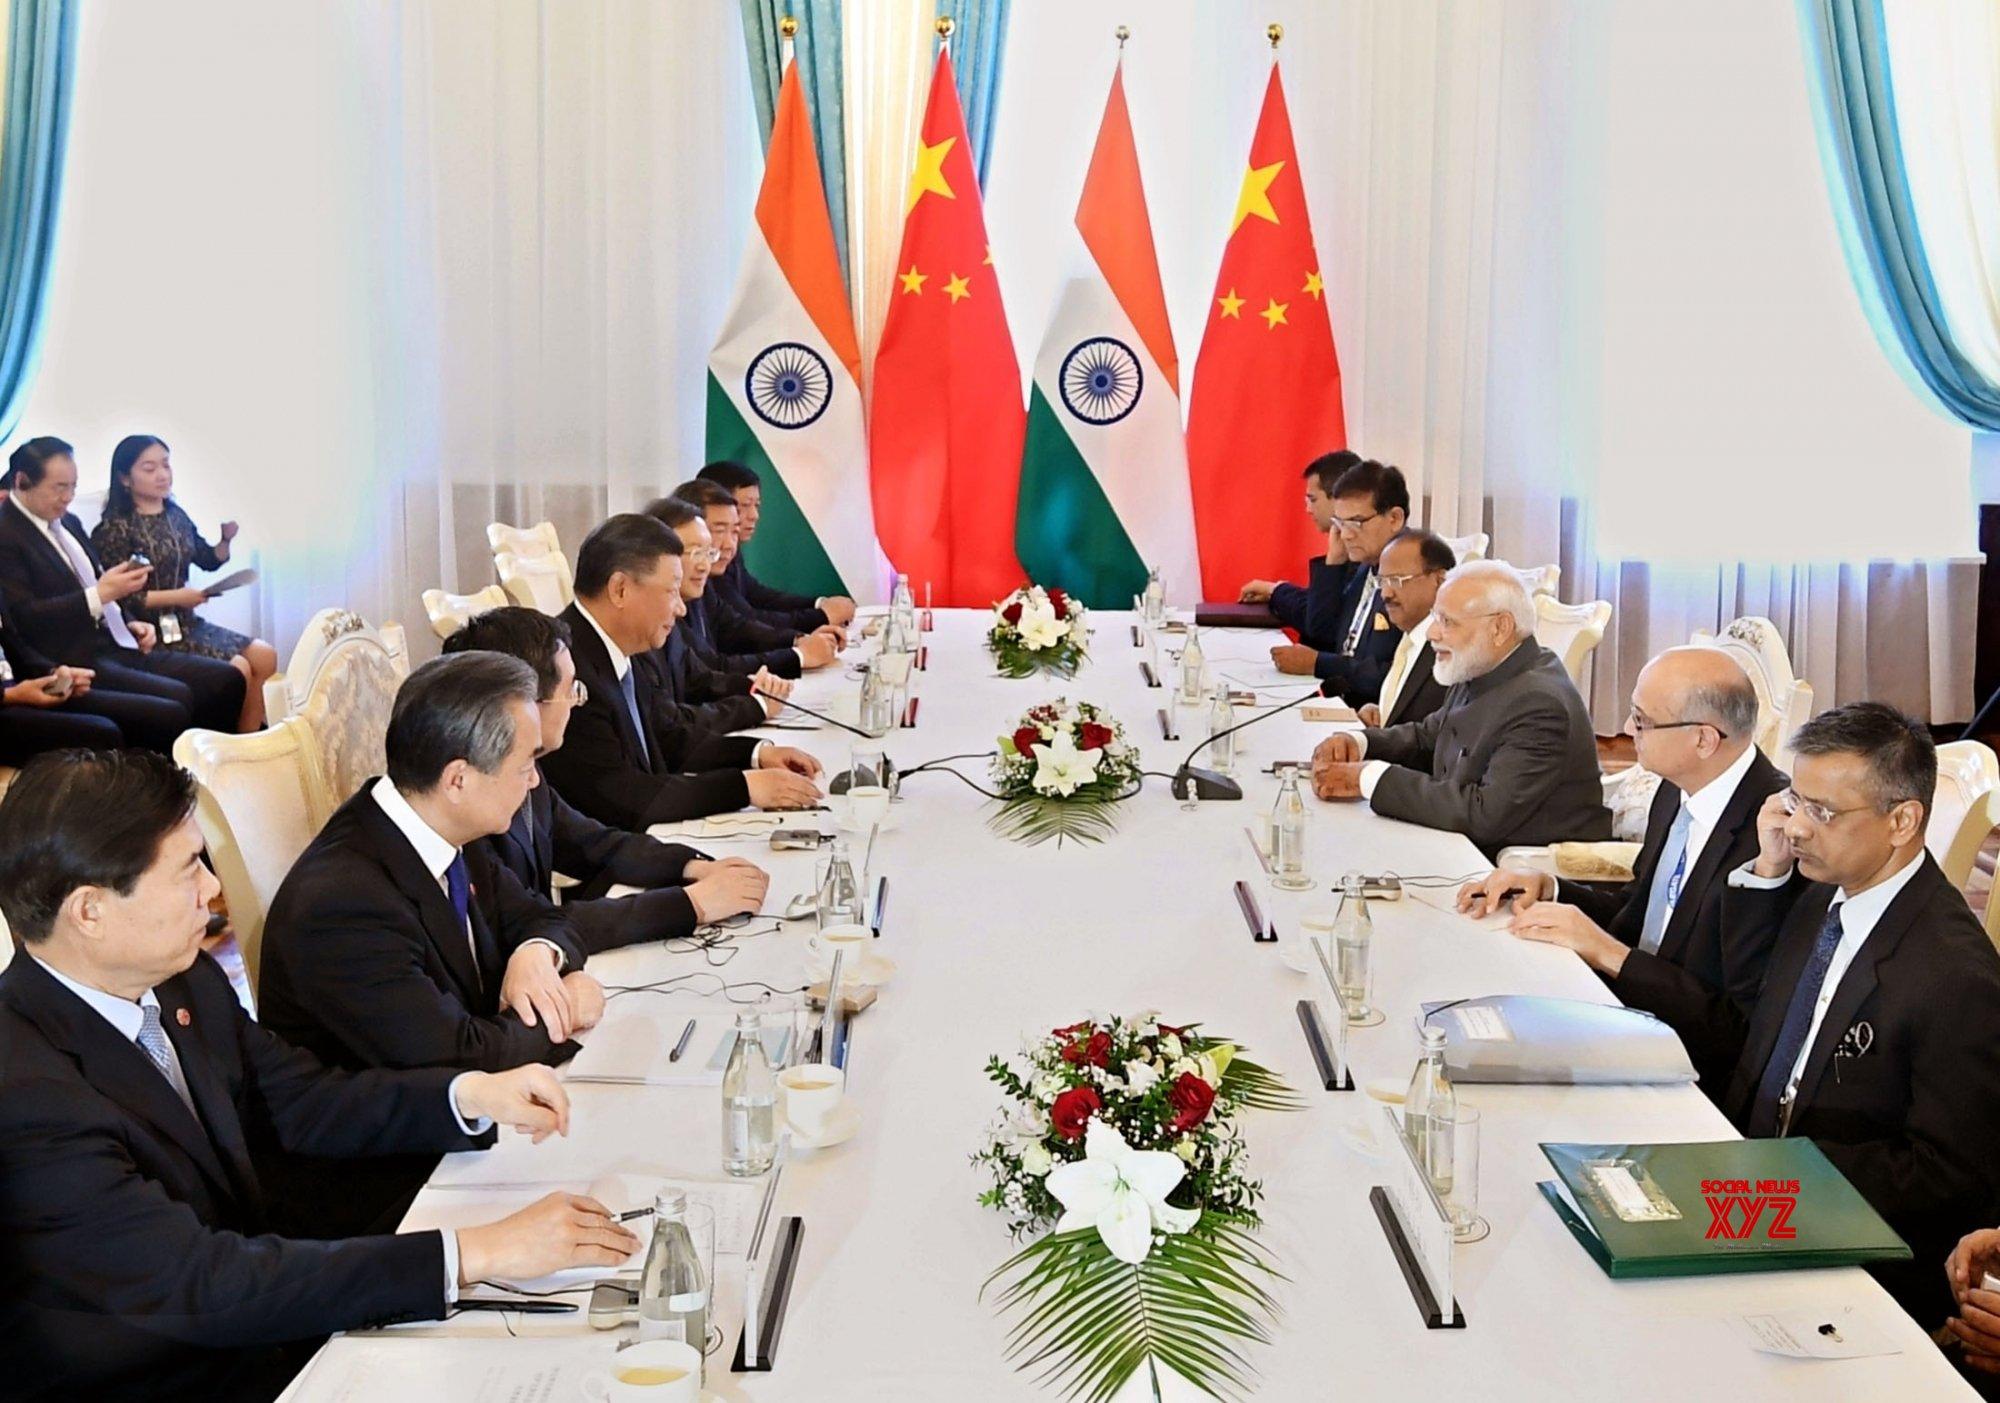 Bishkek: PM Modi meets Chinese President Xi Jinping (Batch - 2) #Gallery